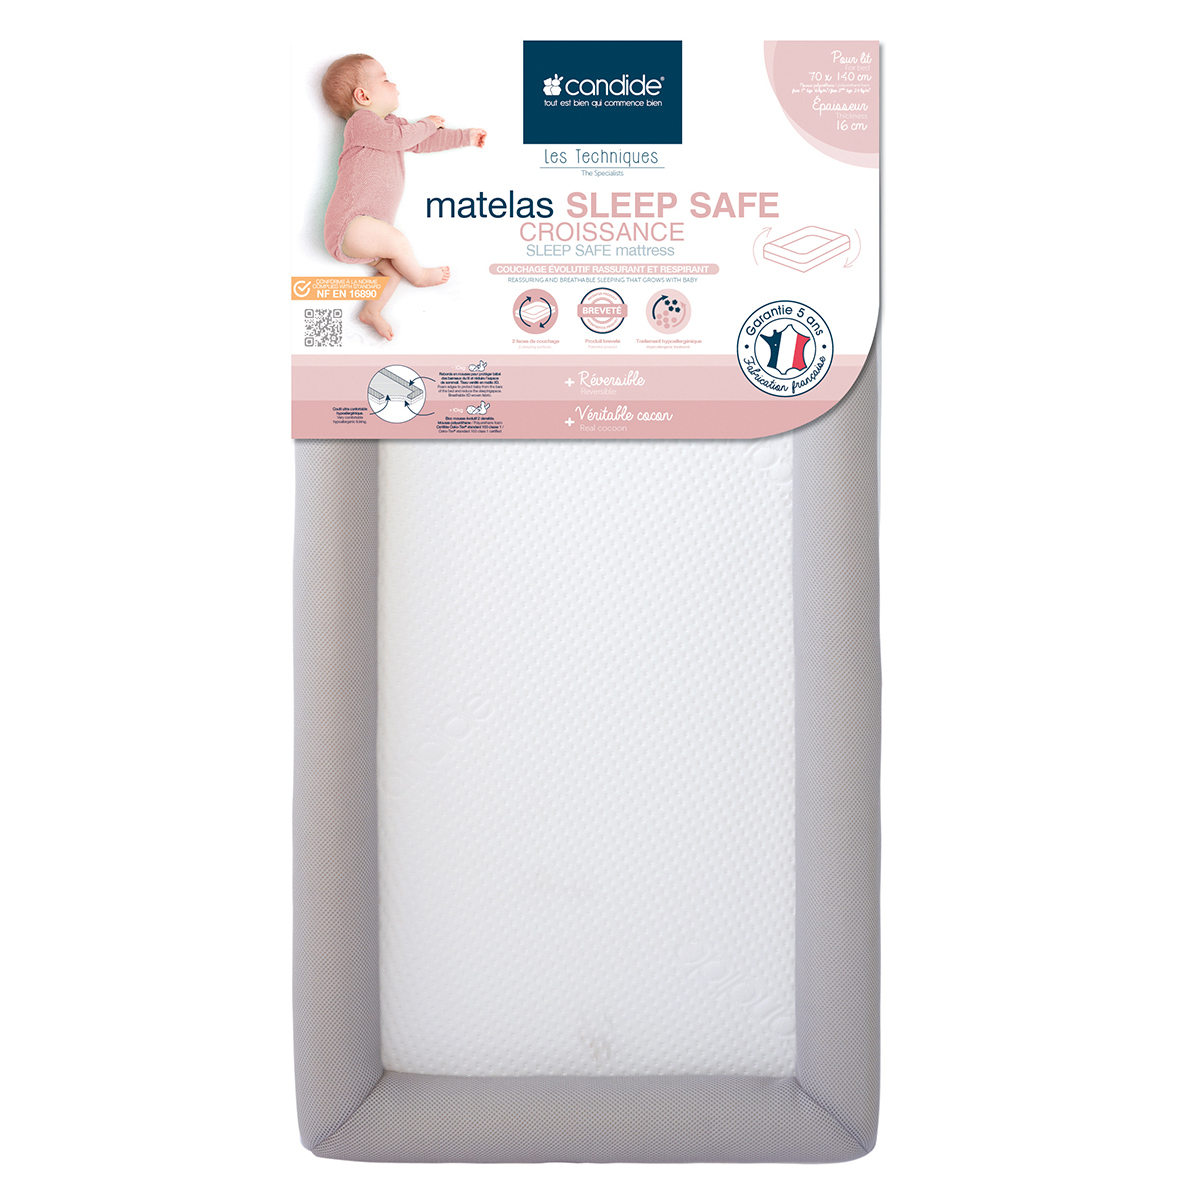 Matelas bébé Matelas Sleep Safe - 70 x 140 cm Matelas Sleep Safe - 70 x 140 cm